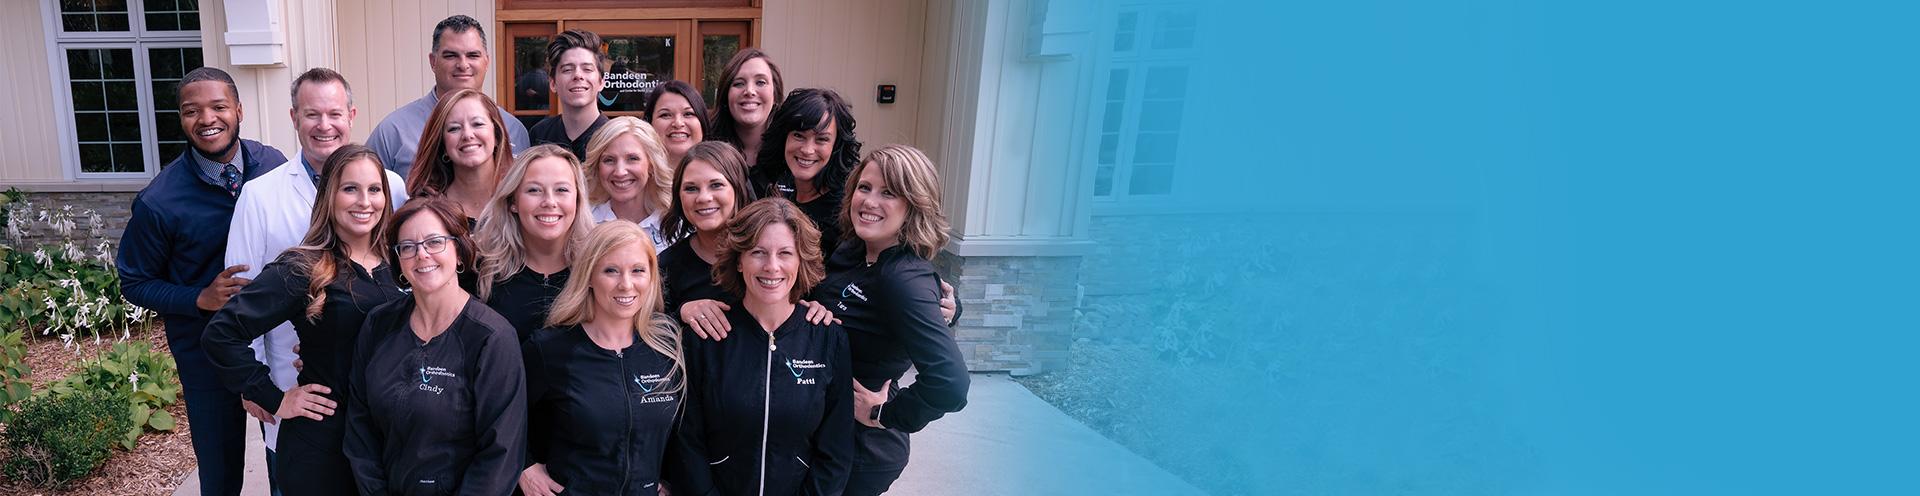 Our Orthodontics Team